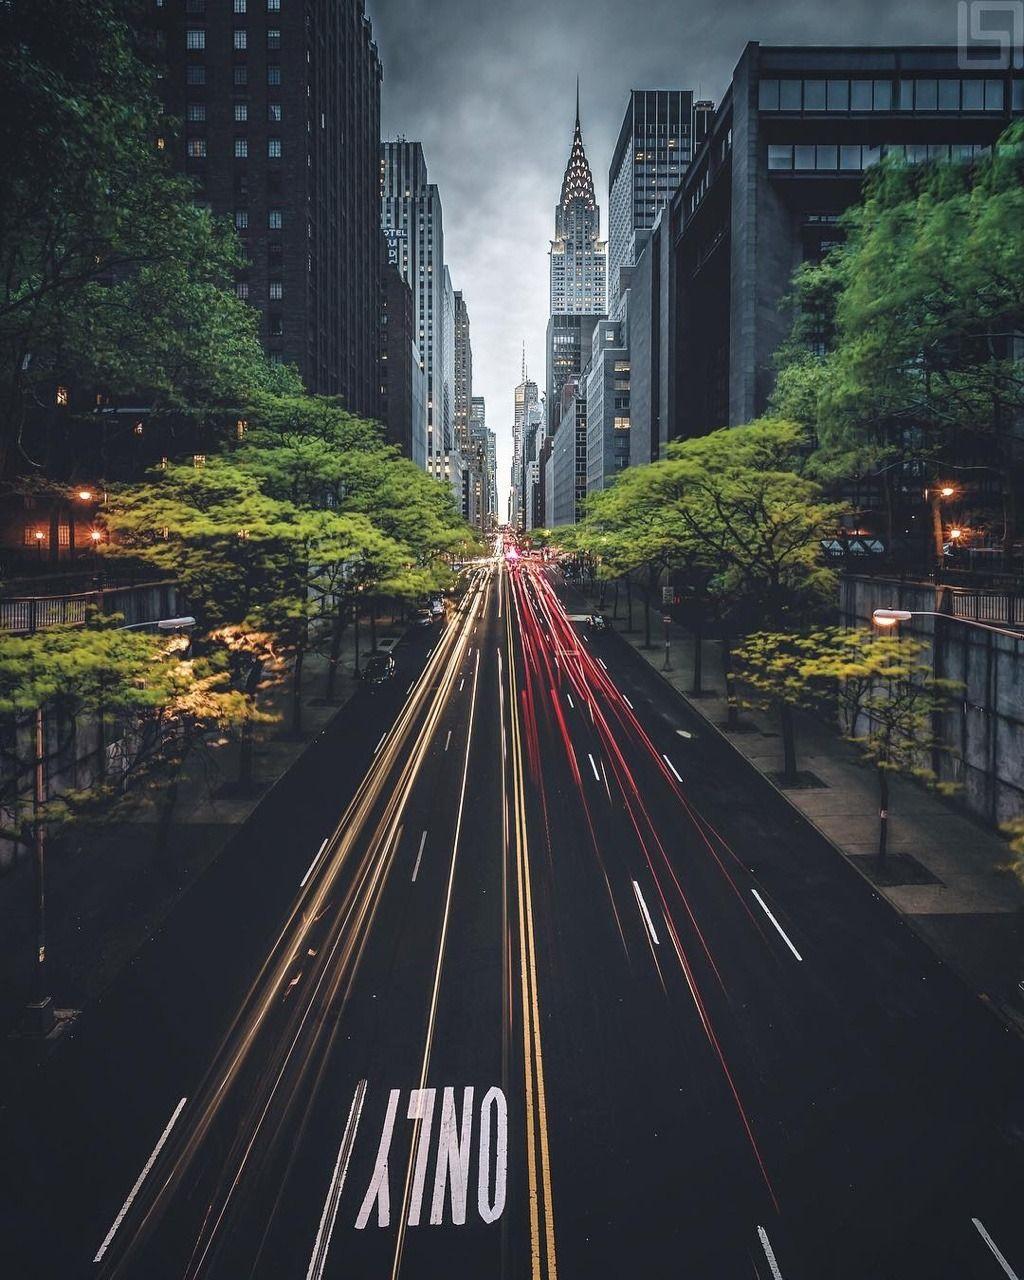 Tudor City Nyc By Paul Seibert Photography Pseibertphoto City Landscape Urban Landscape New York Life